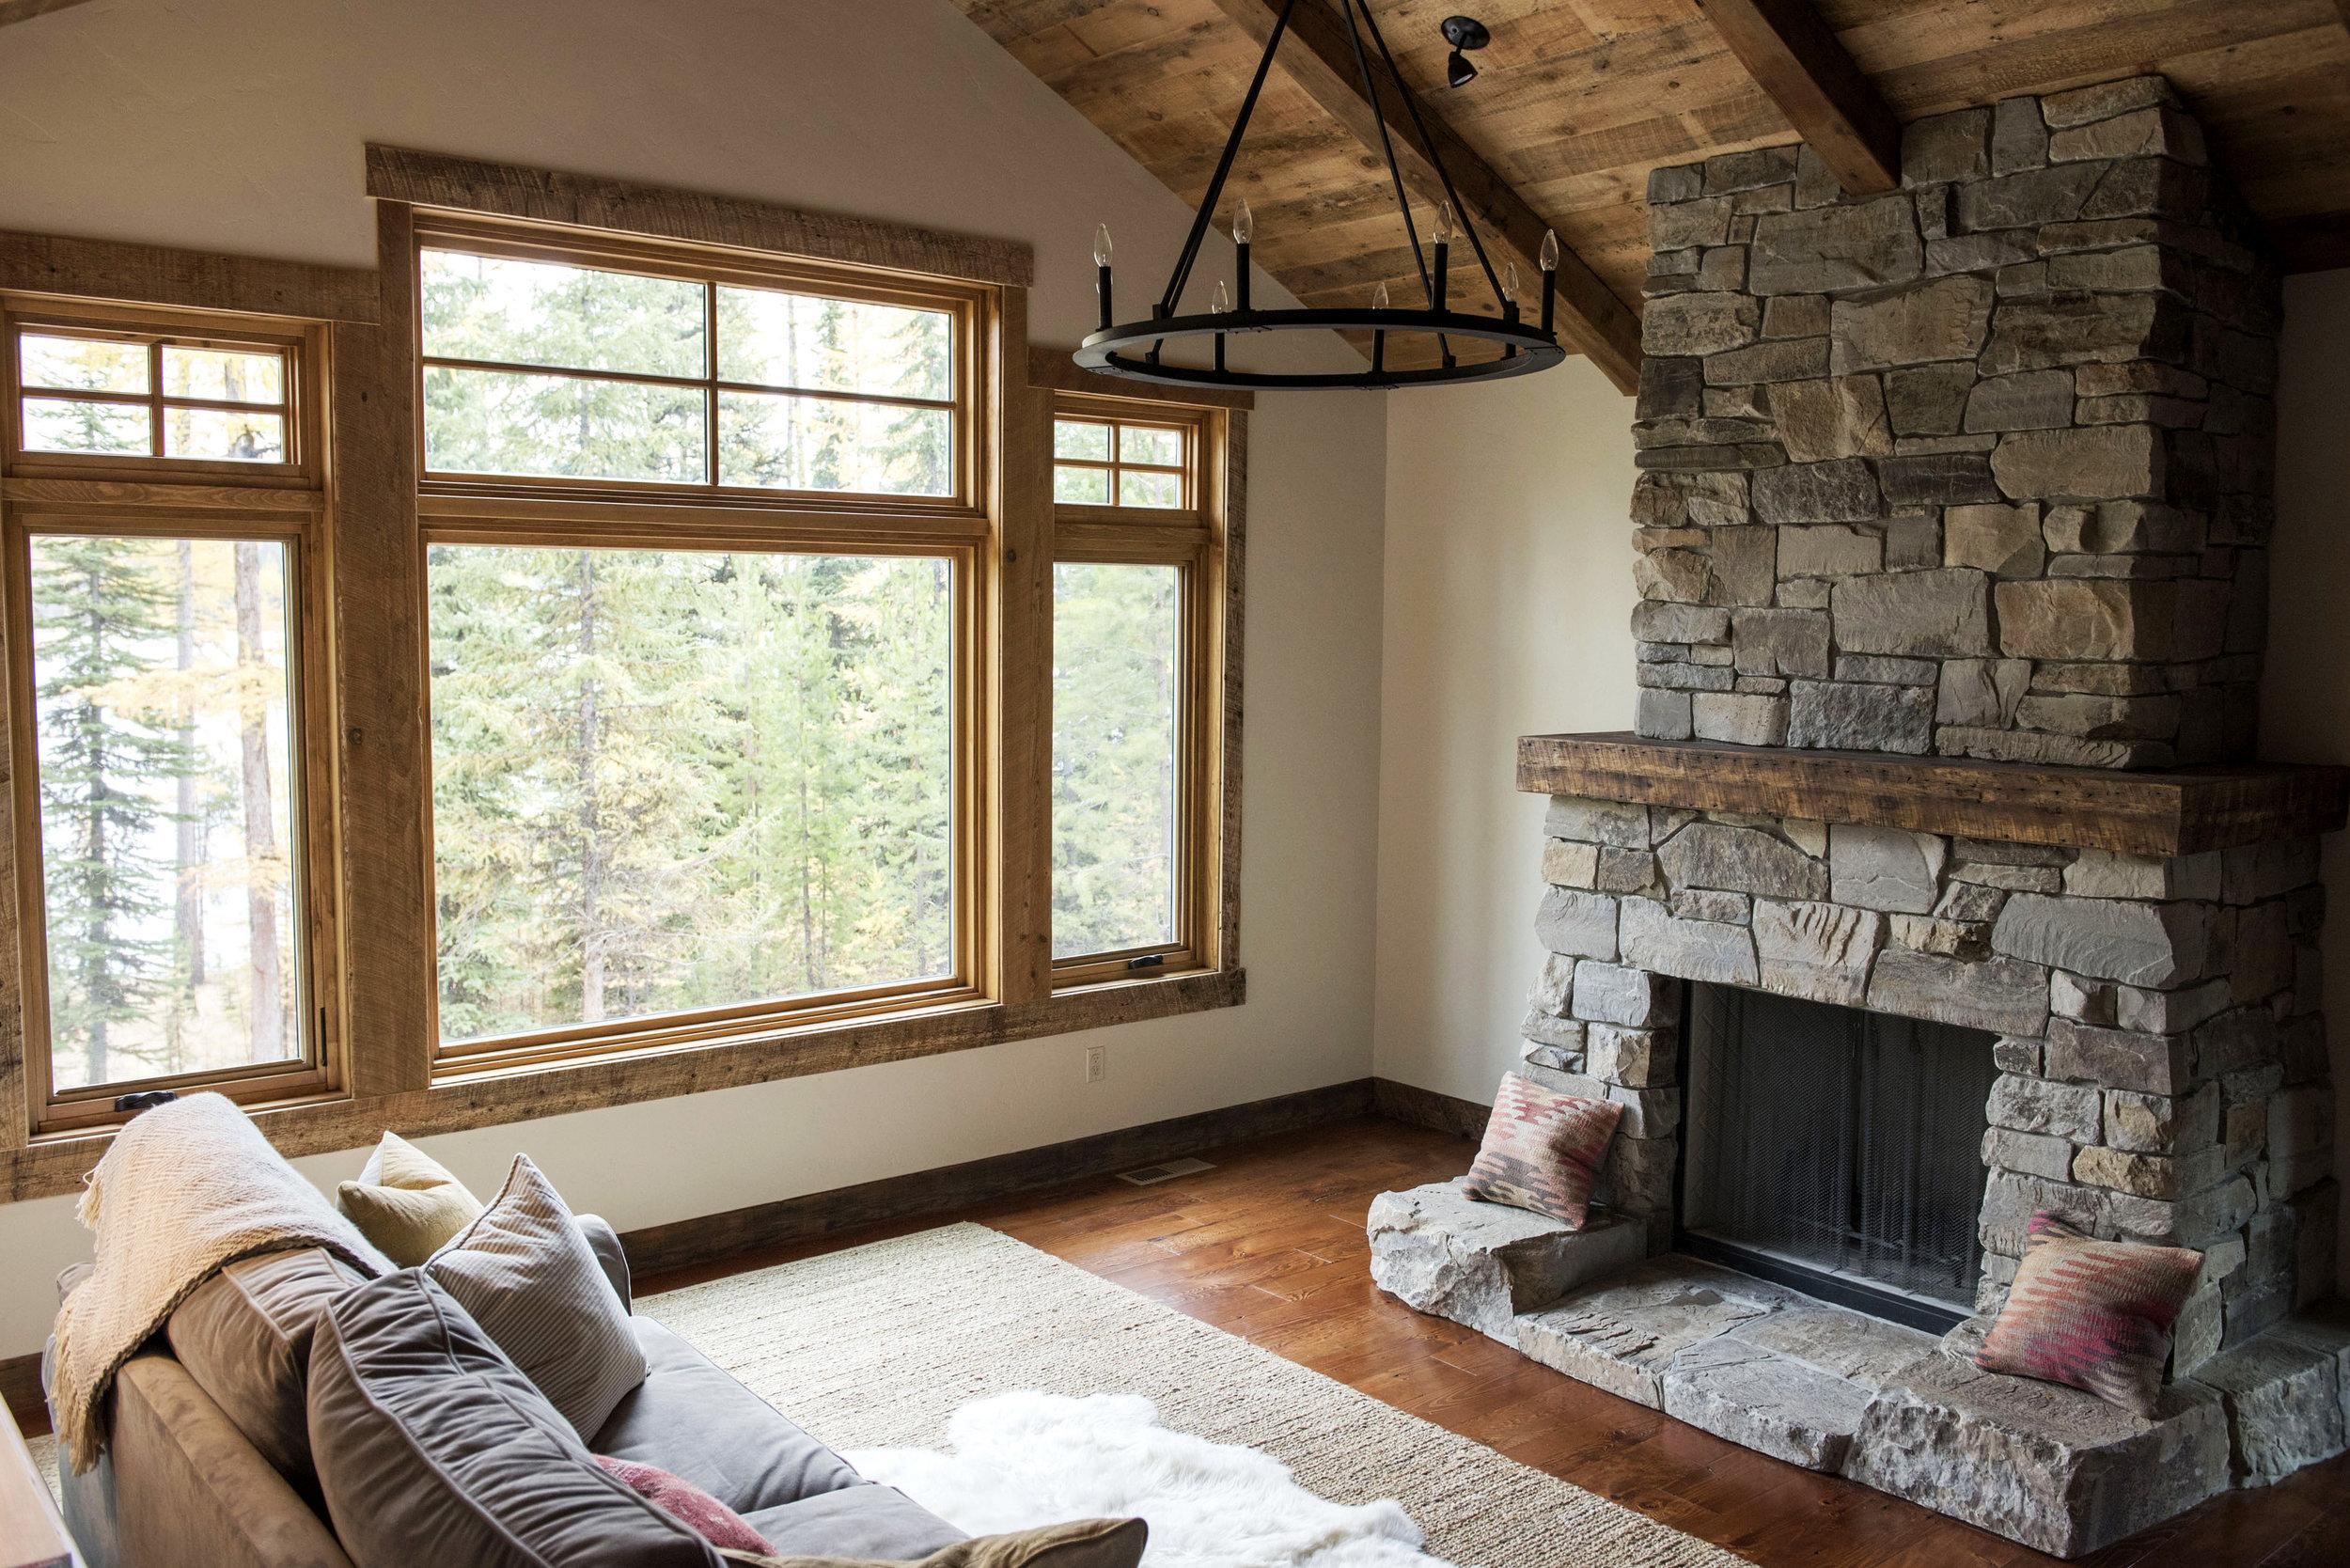 Cozy Reclaimed Wood Cabin